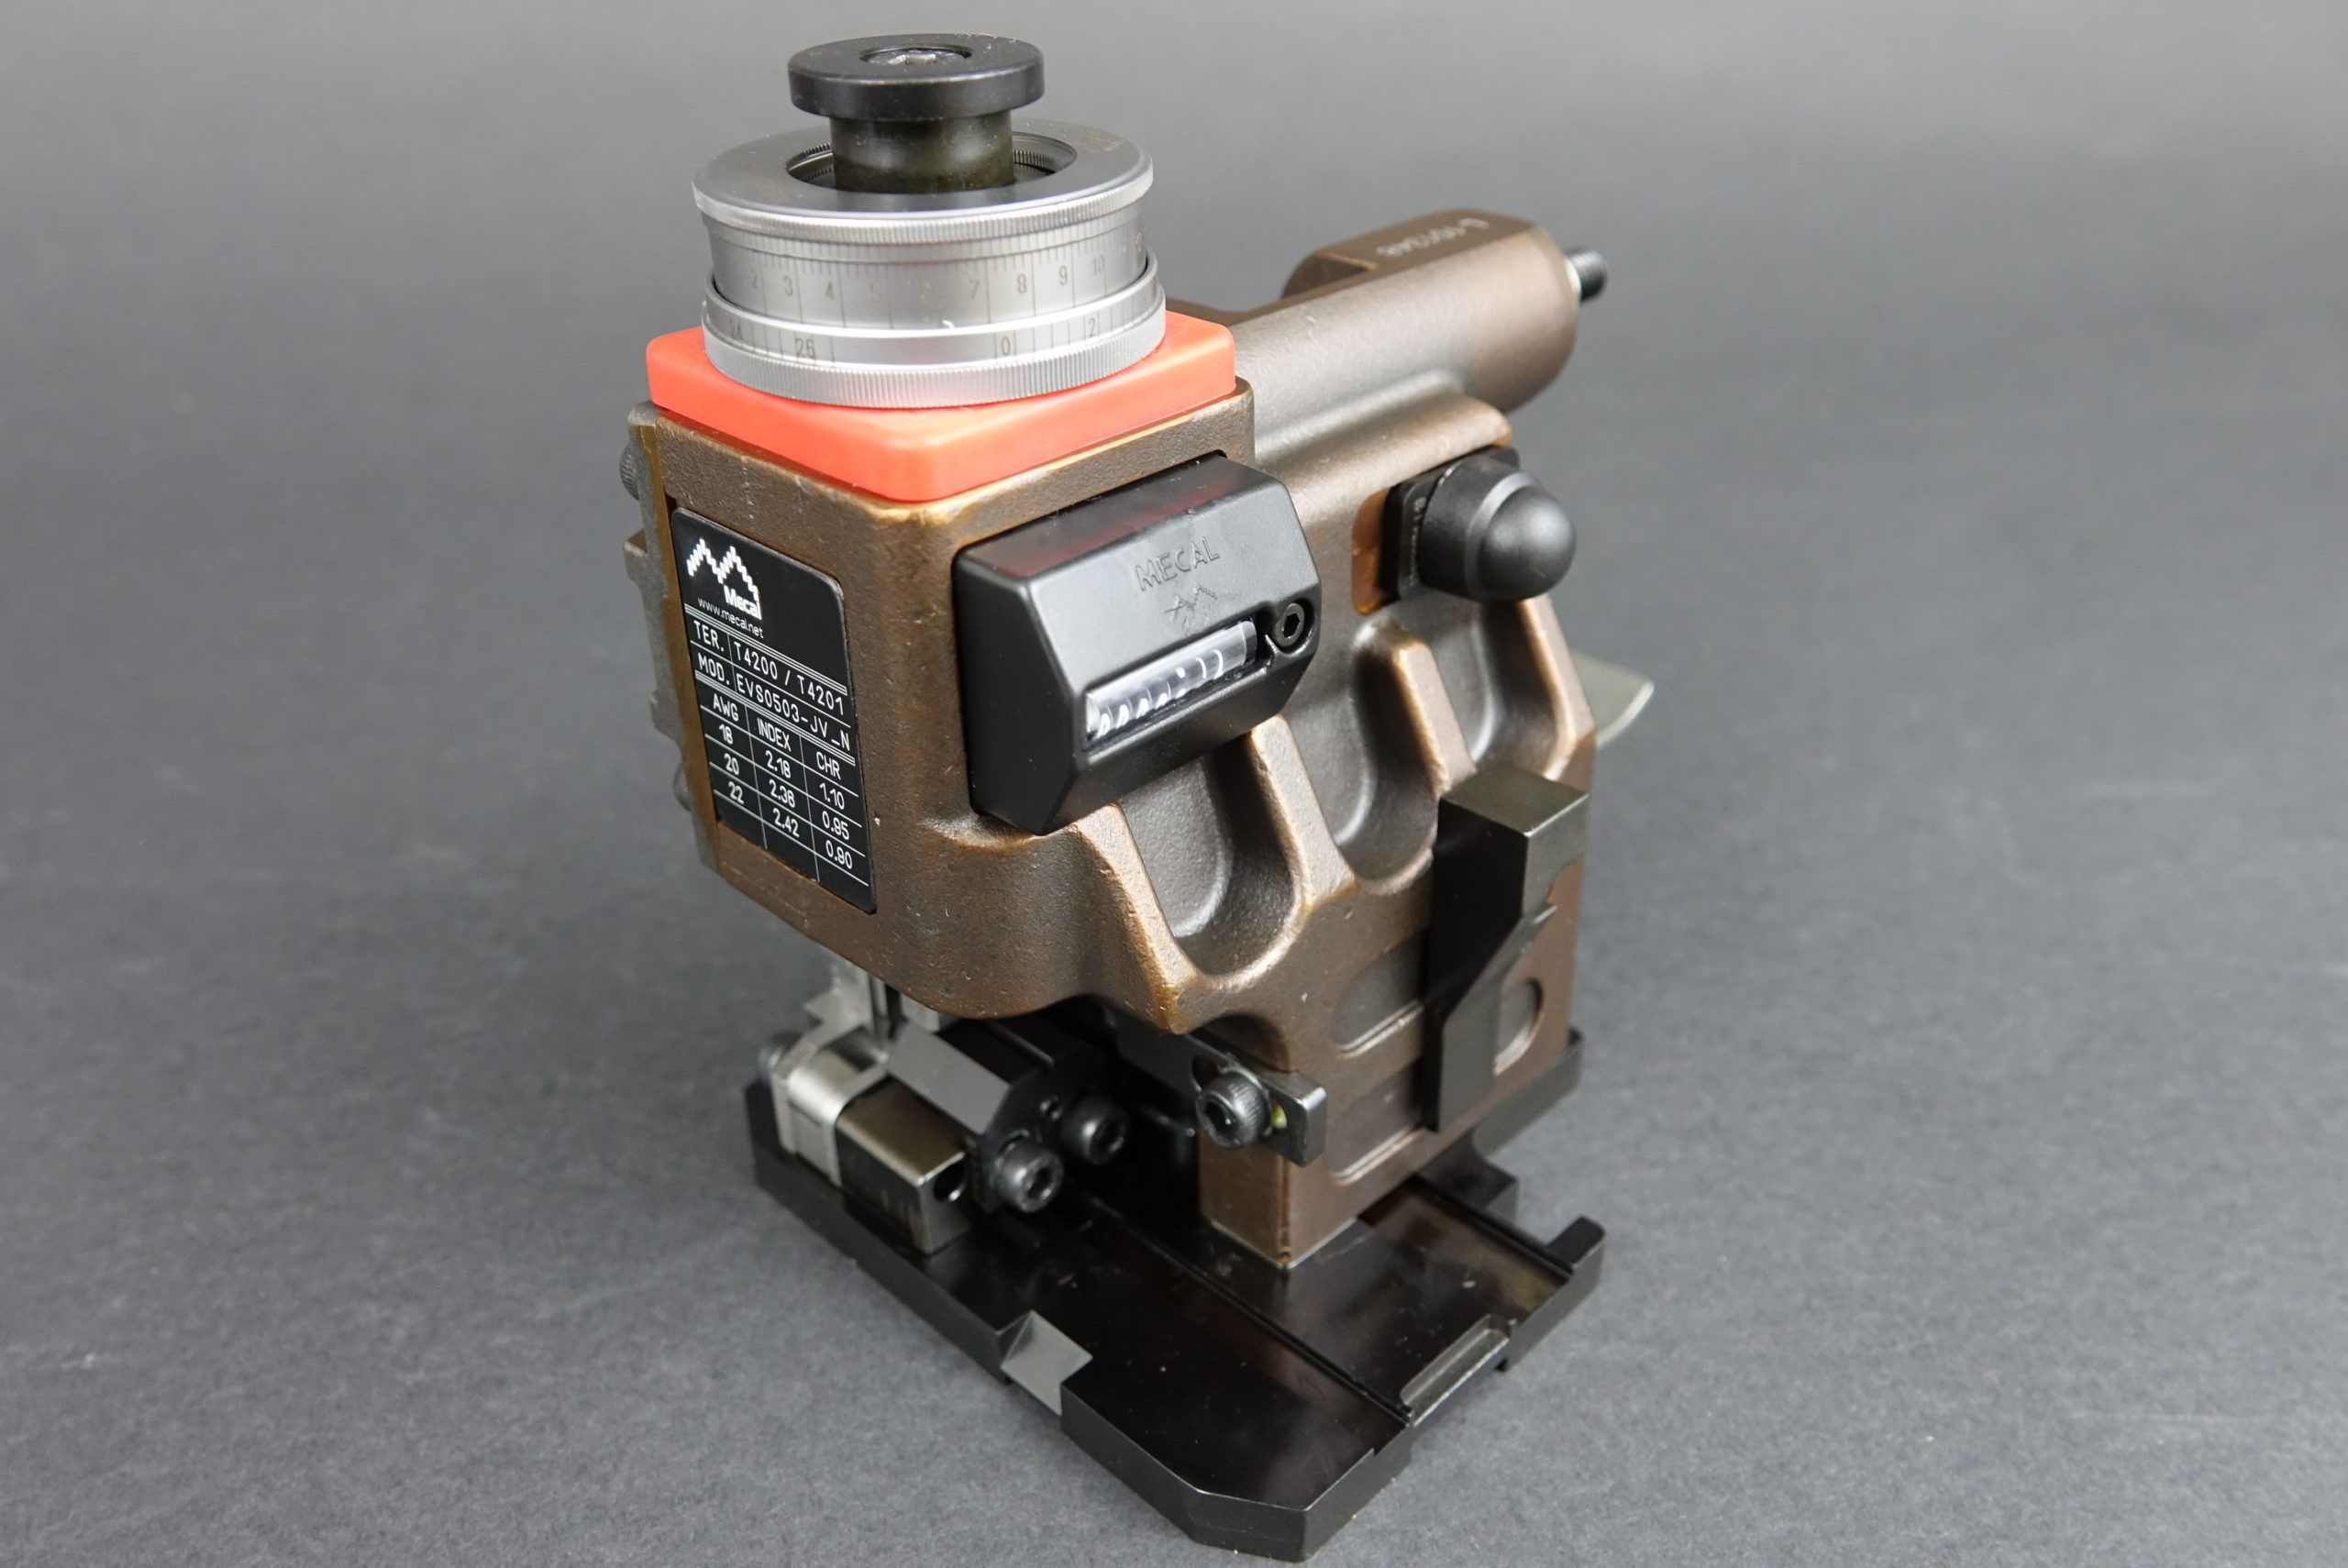 aplicator for mini fit serie, Mecal, rast 4.2, T4200